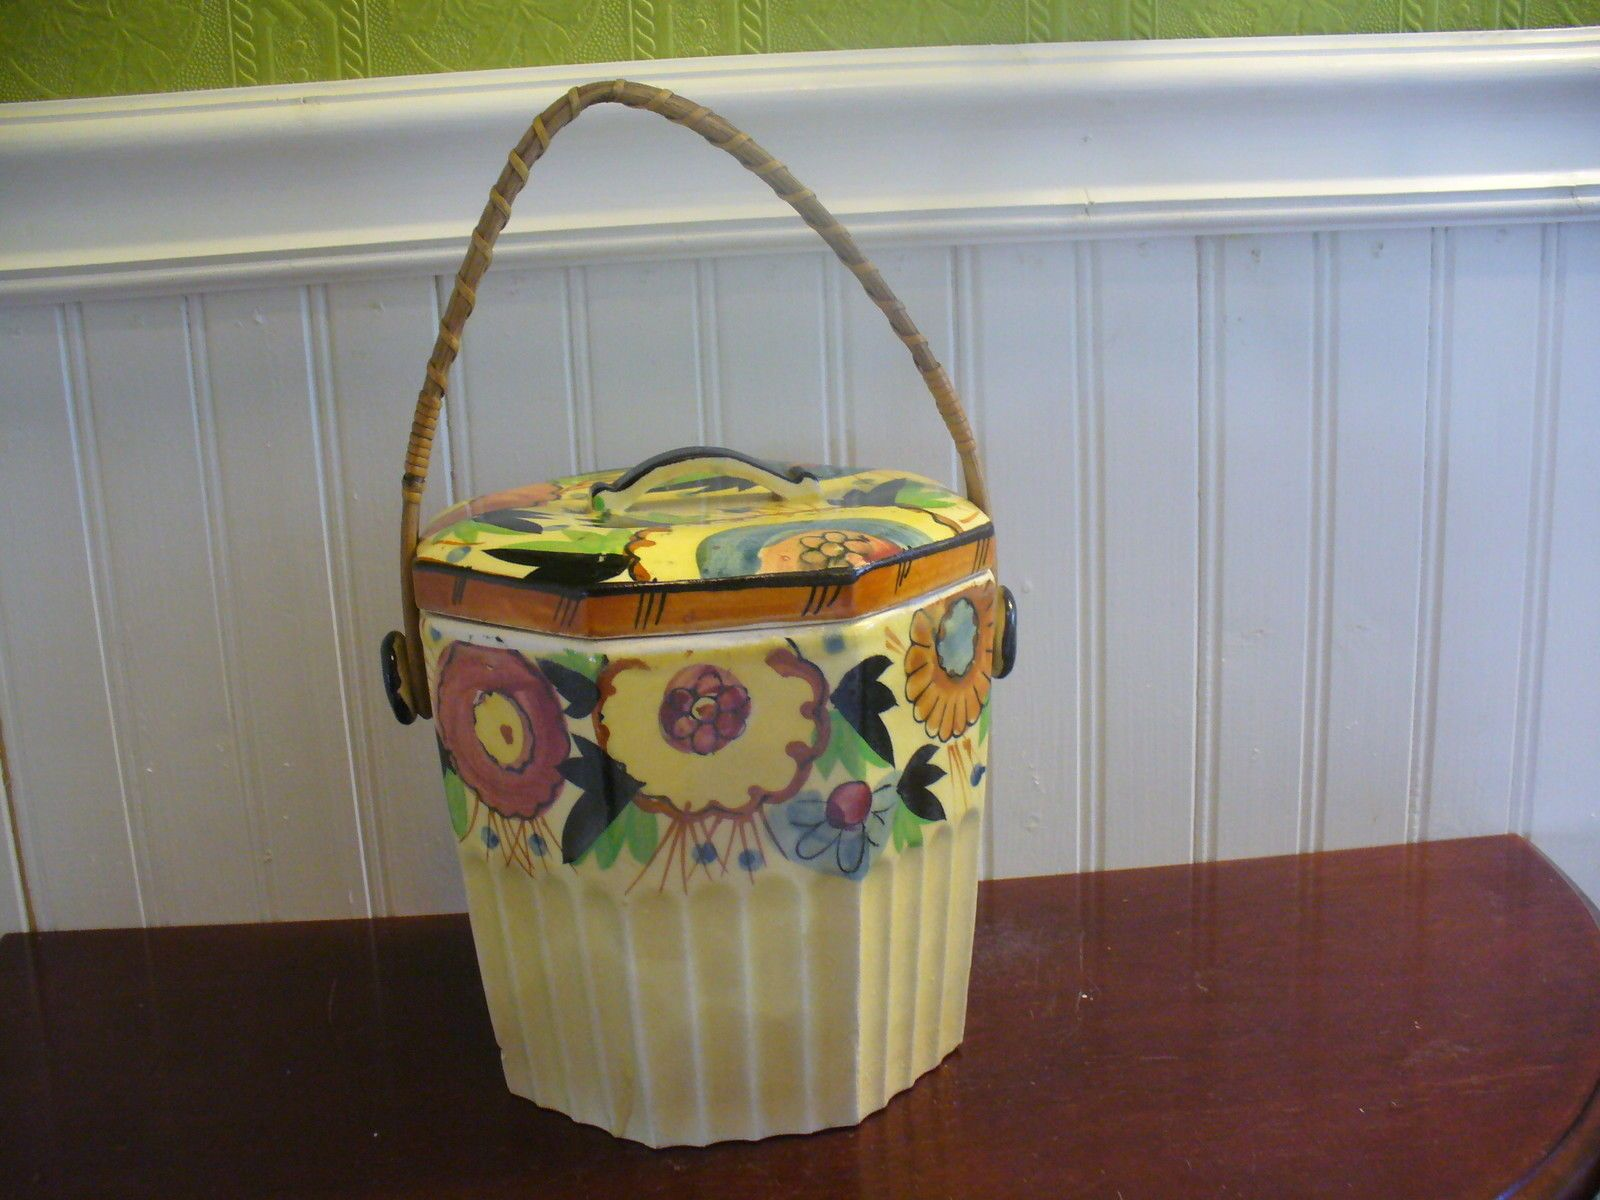 Vintage Japan Hand Painted Porcelain Floral Motif Wicker Handle Biscuit Jar | eBay & Vintage Japan Hand Painted Porcelain Floral Motif Wicker Handle ...